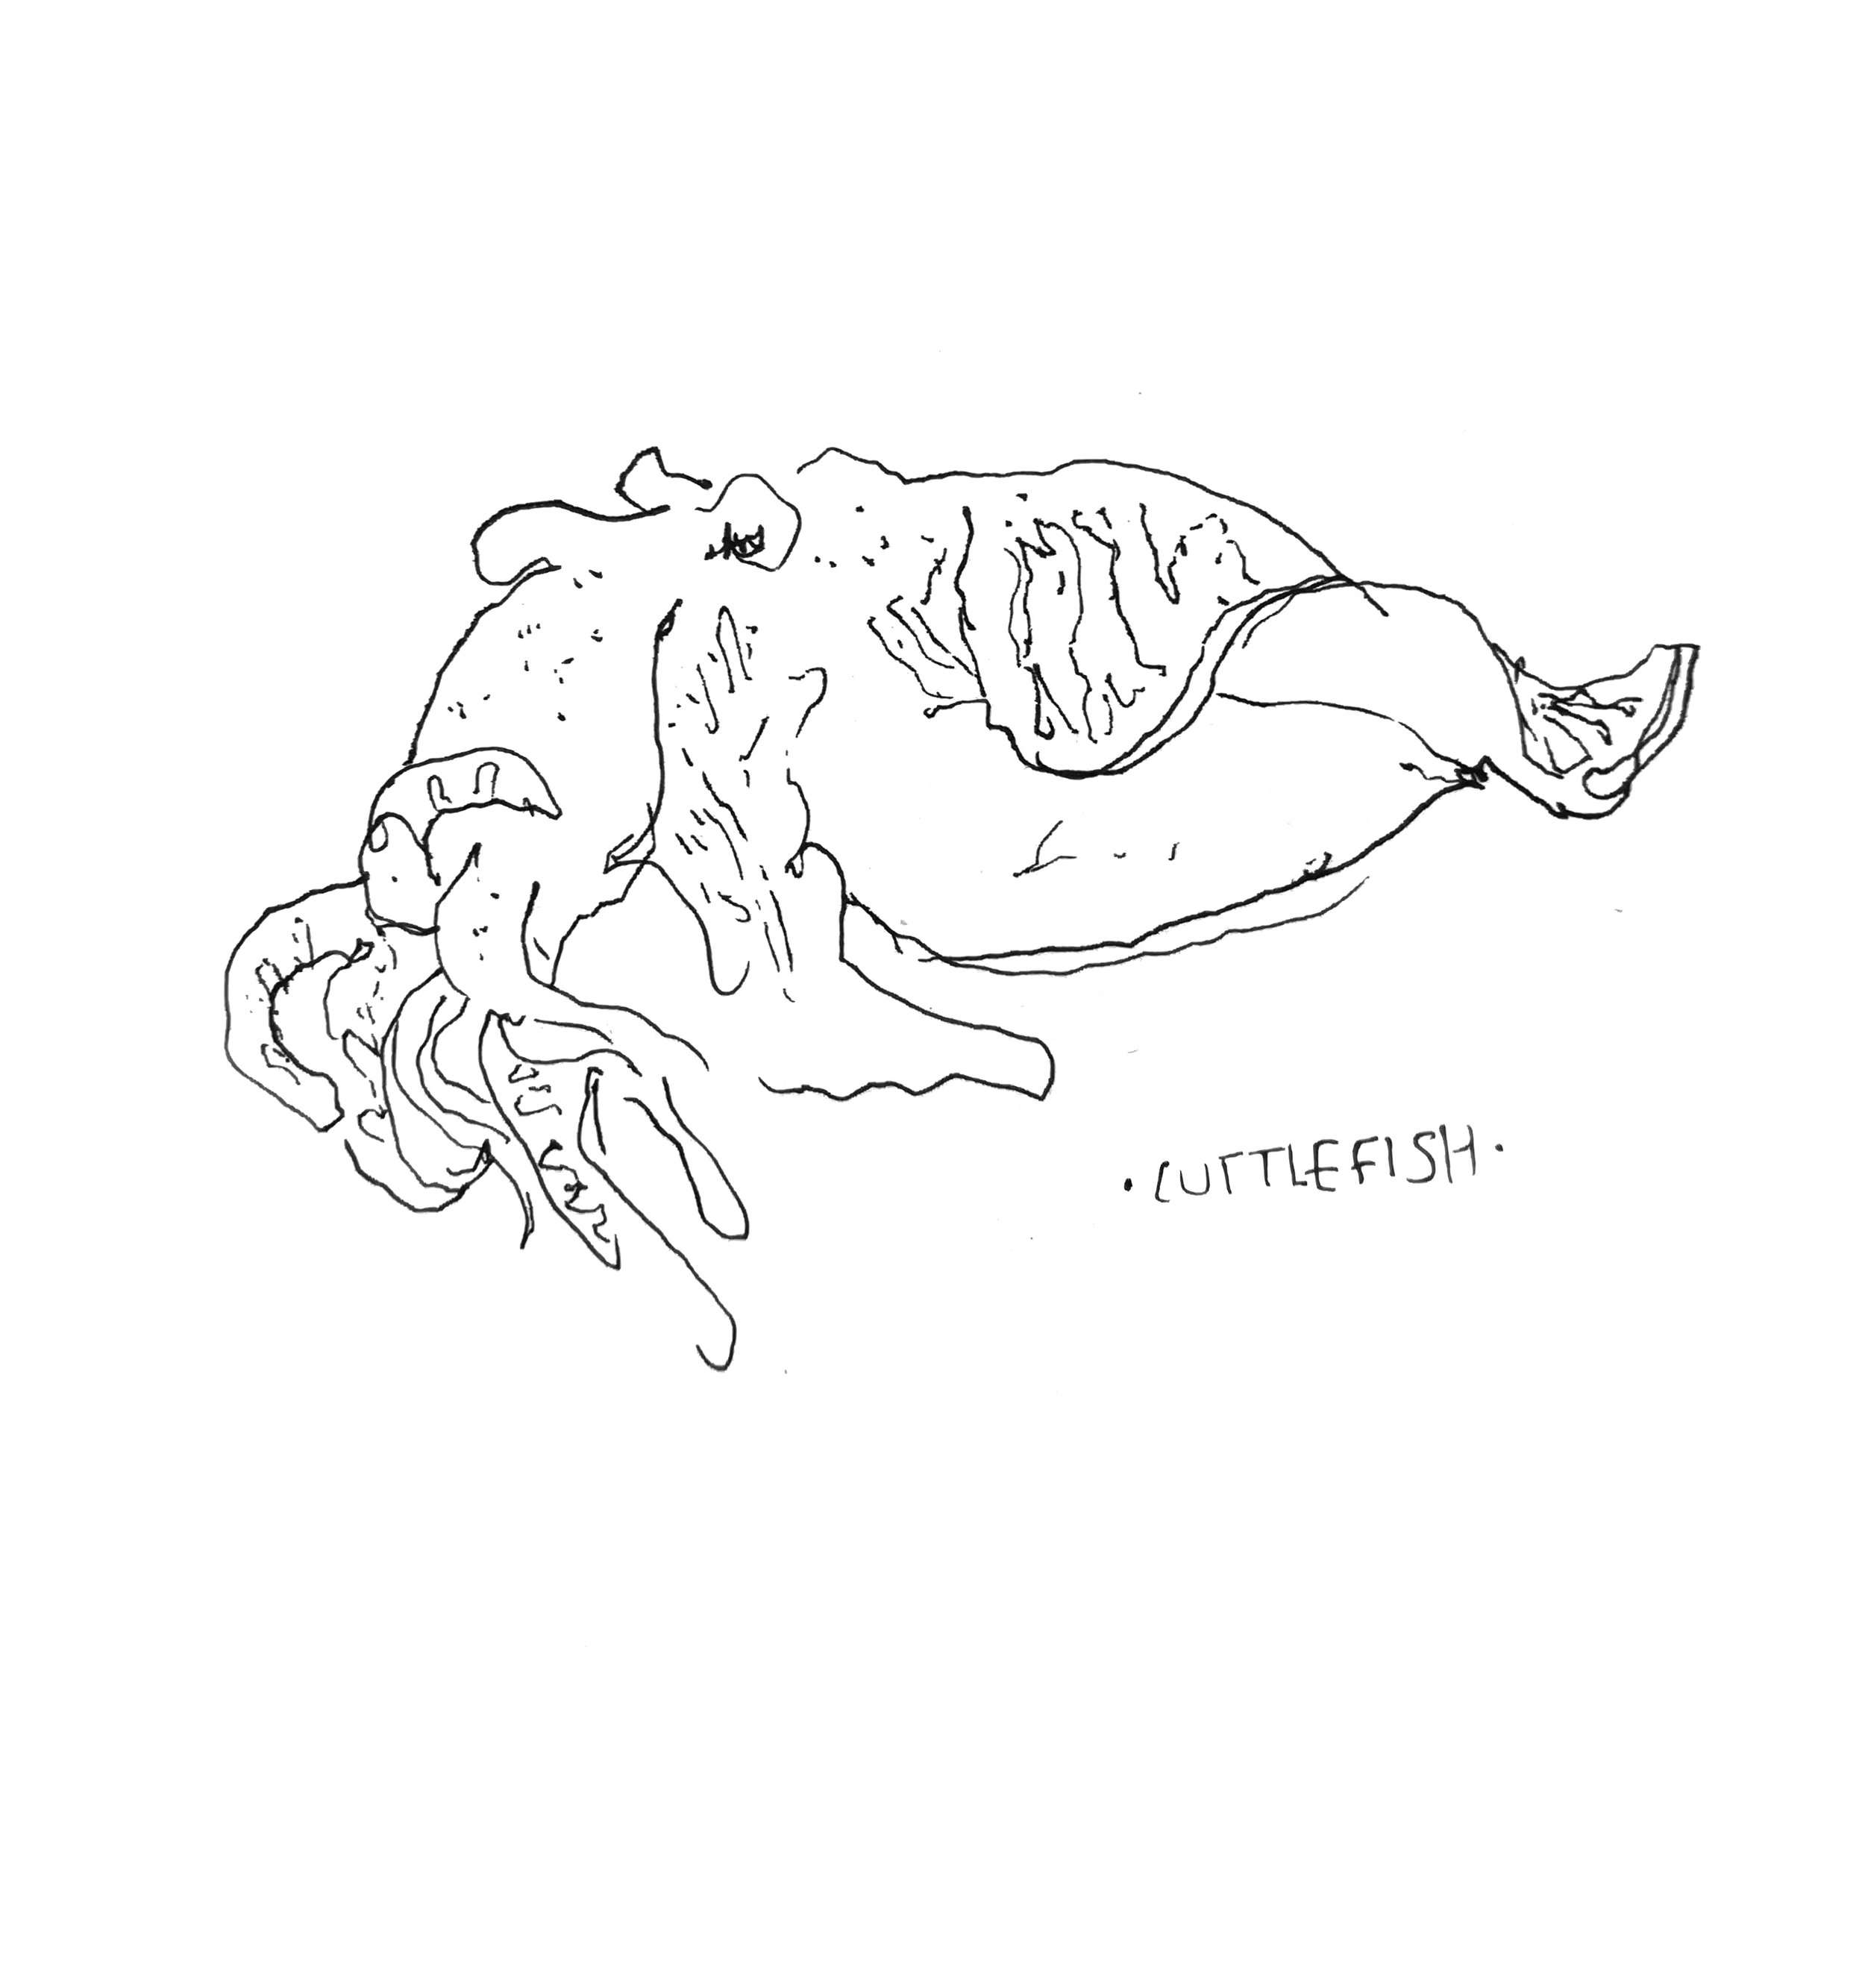 cuttlefish1.jpg